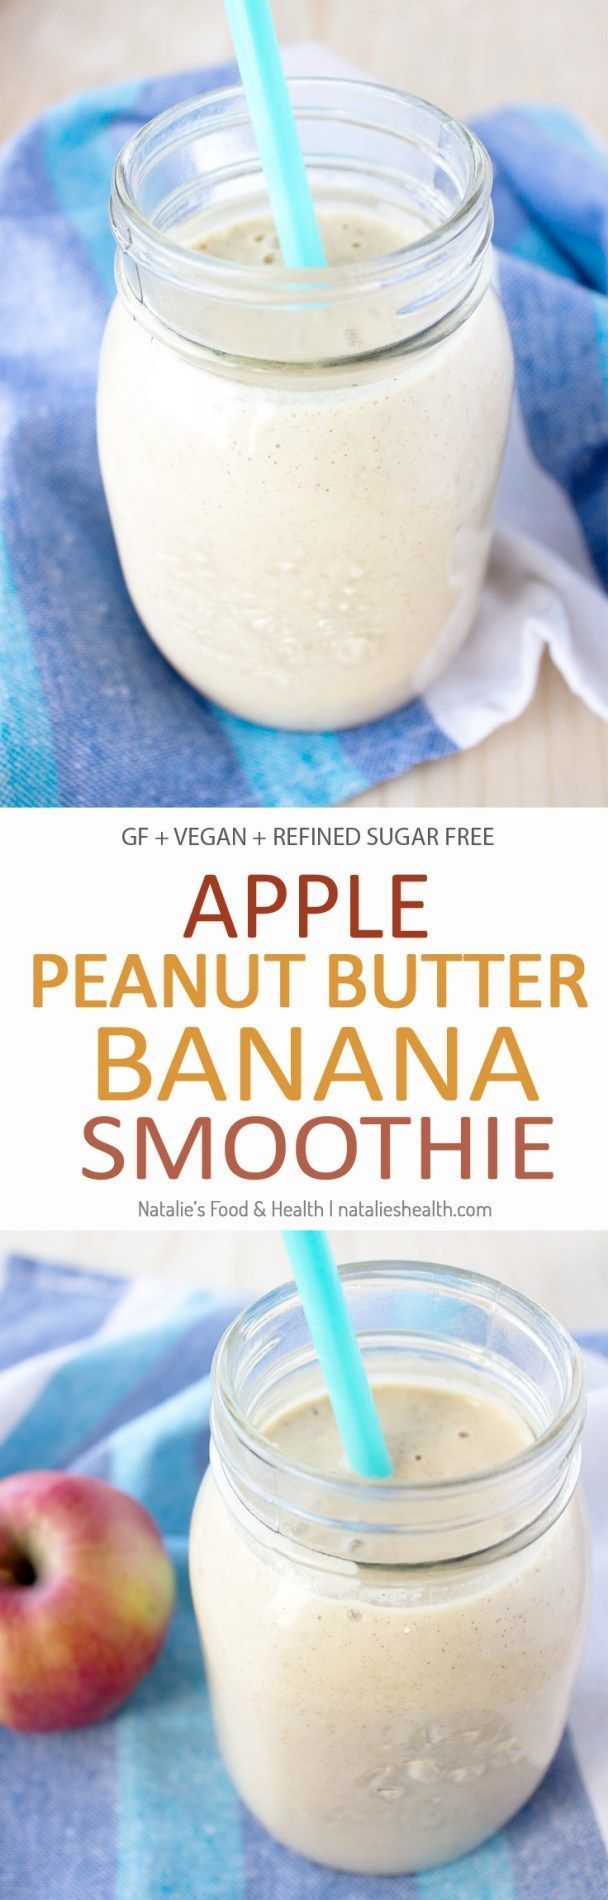 Apple Peanut Butter Banana Smoothie - Natalie's Food & Health